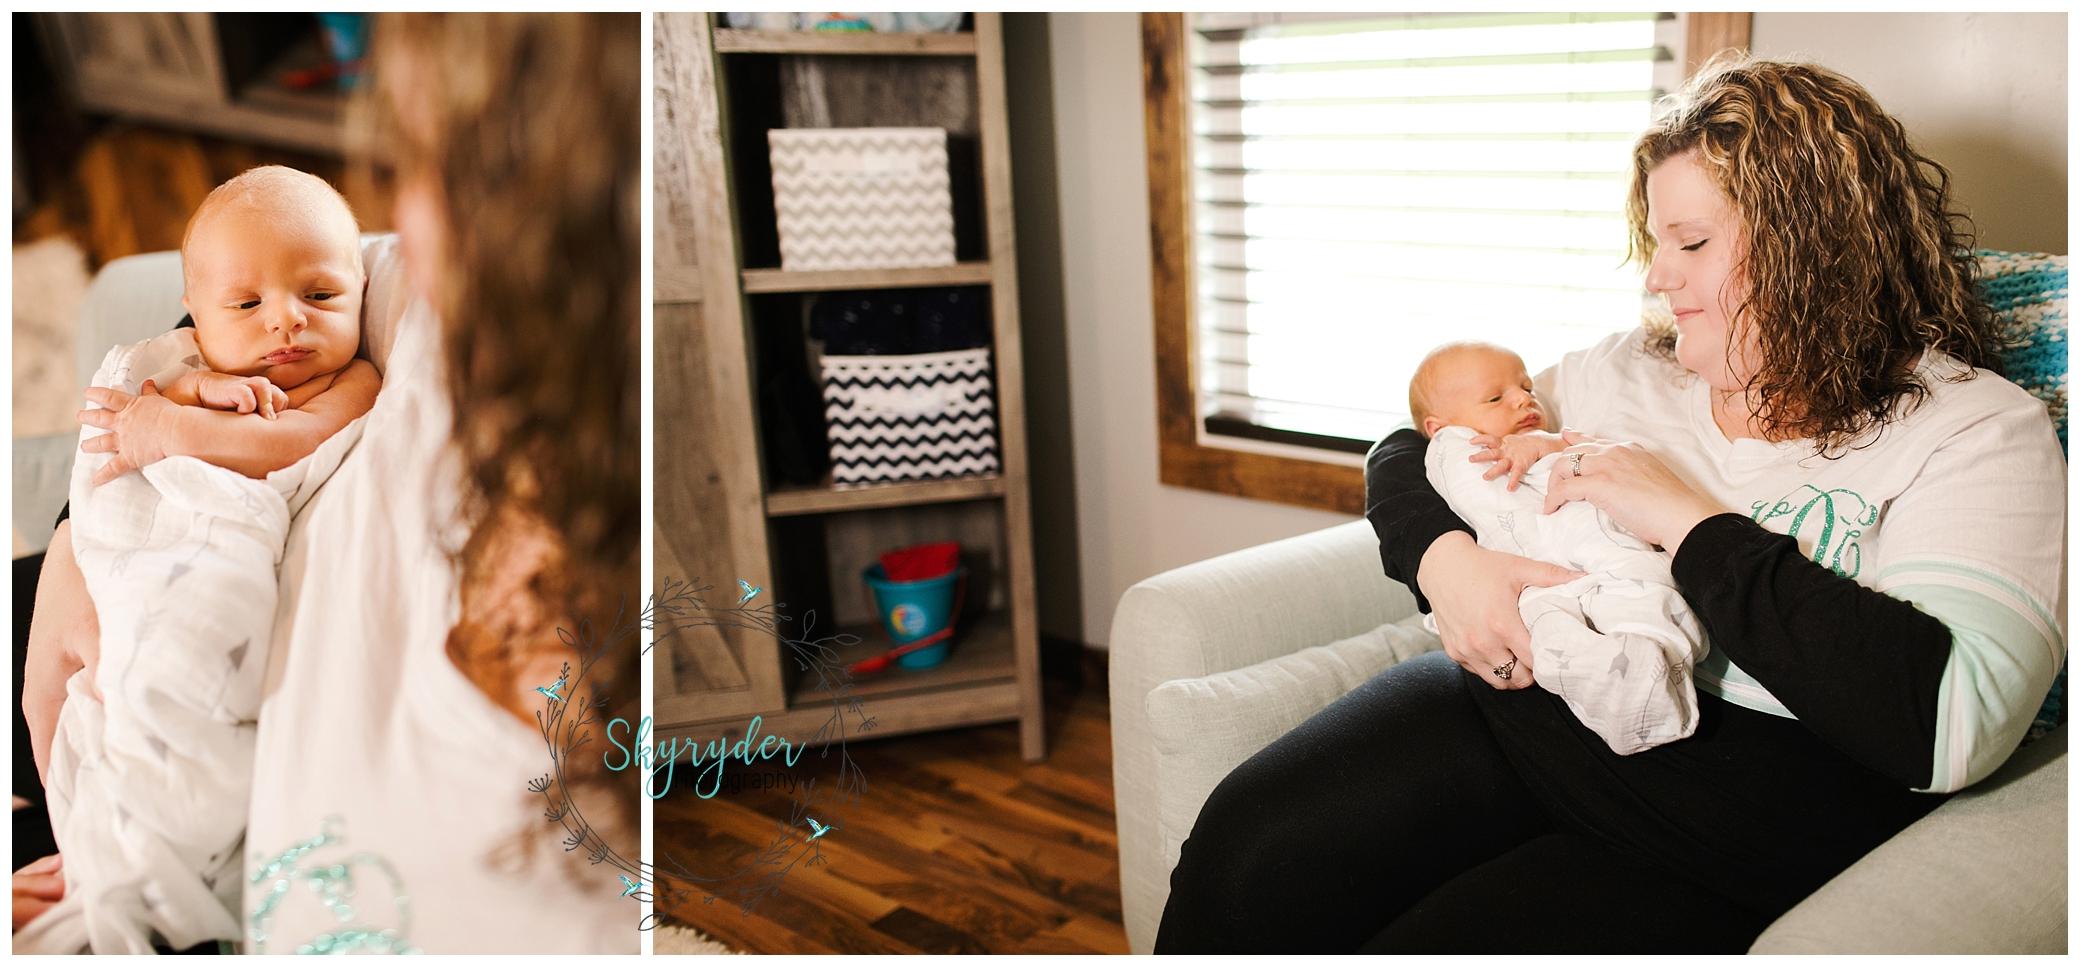 Baby Marshall   Floyd Newborn Photographer   lifestyle newborn session maternity baby blacksburg photographer photography roanoke skyryder virginia